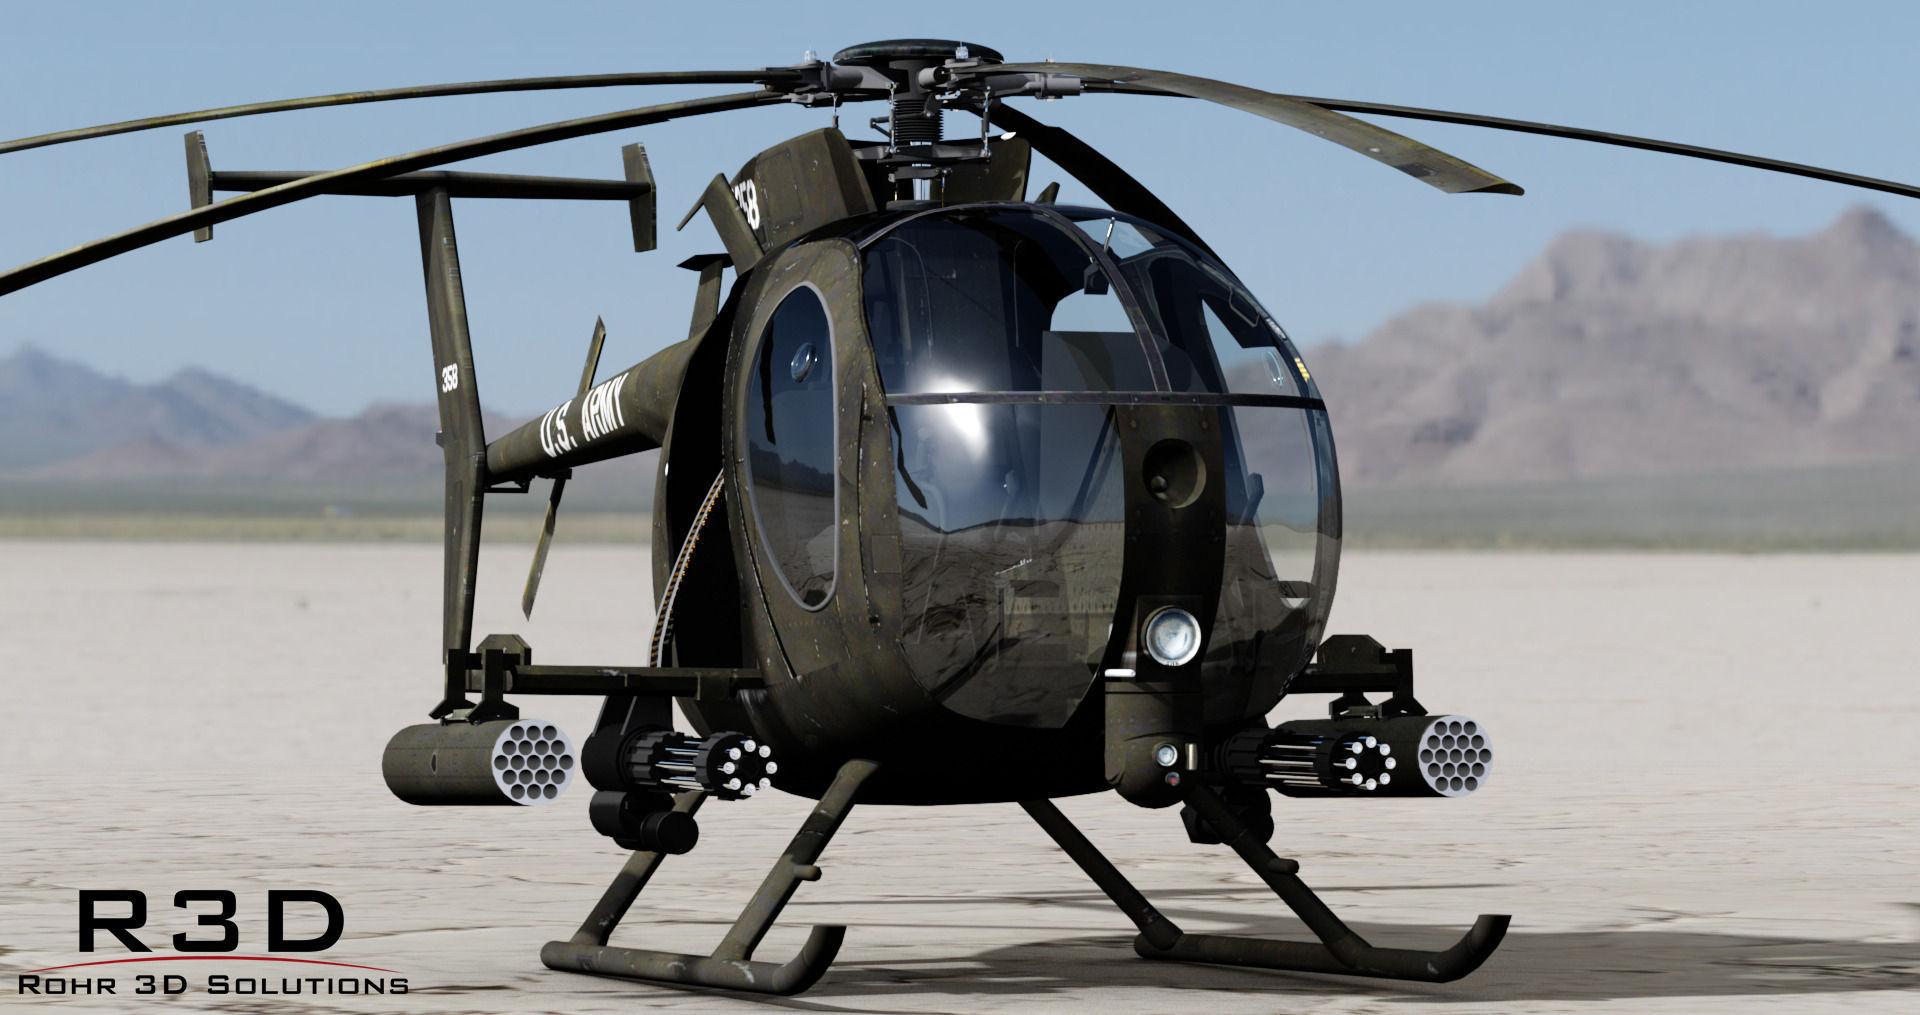 MH-6 Little Bird Gunship 3D Model .max .obj .3ds .fbx .c4d .skp - CGTrader.com